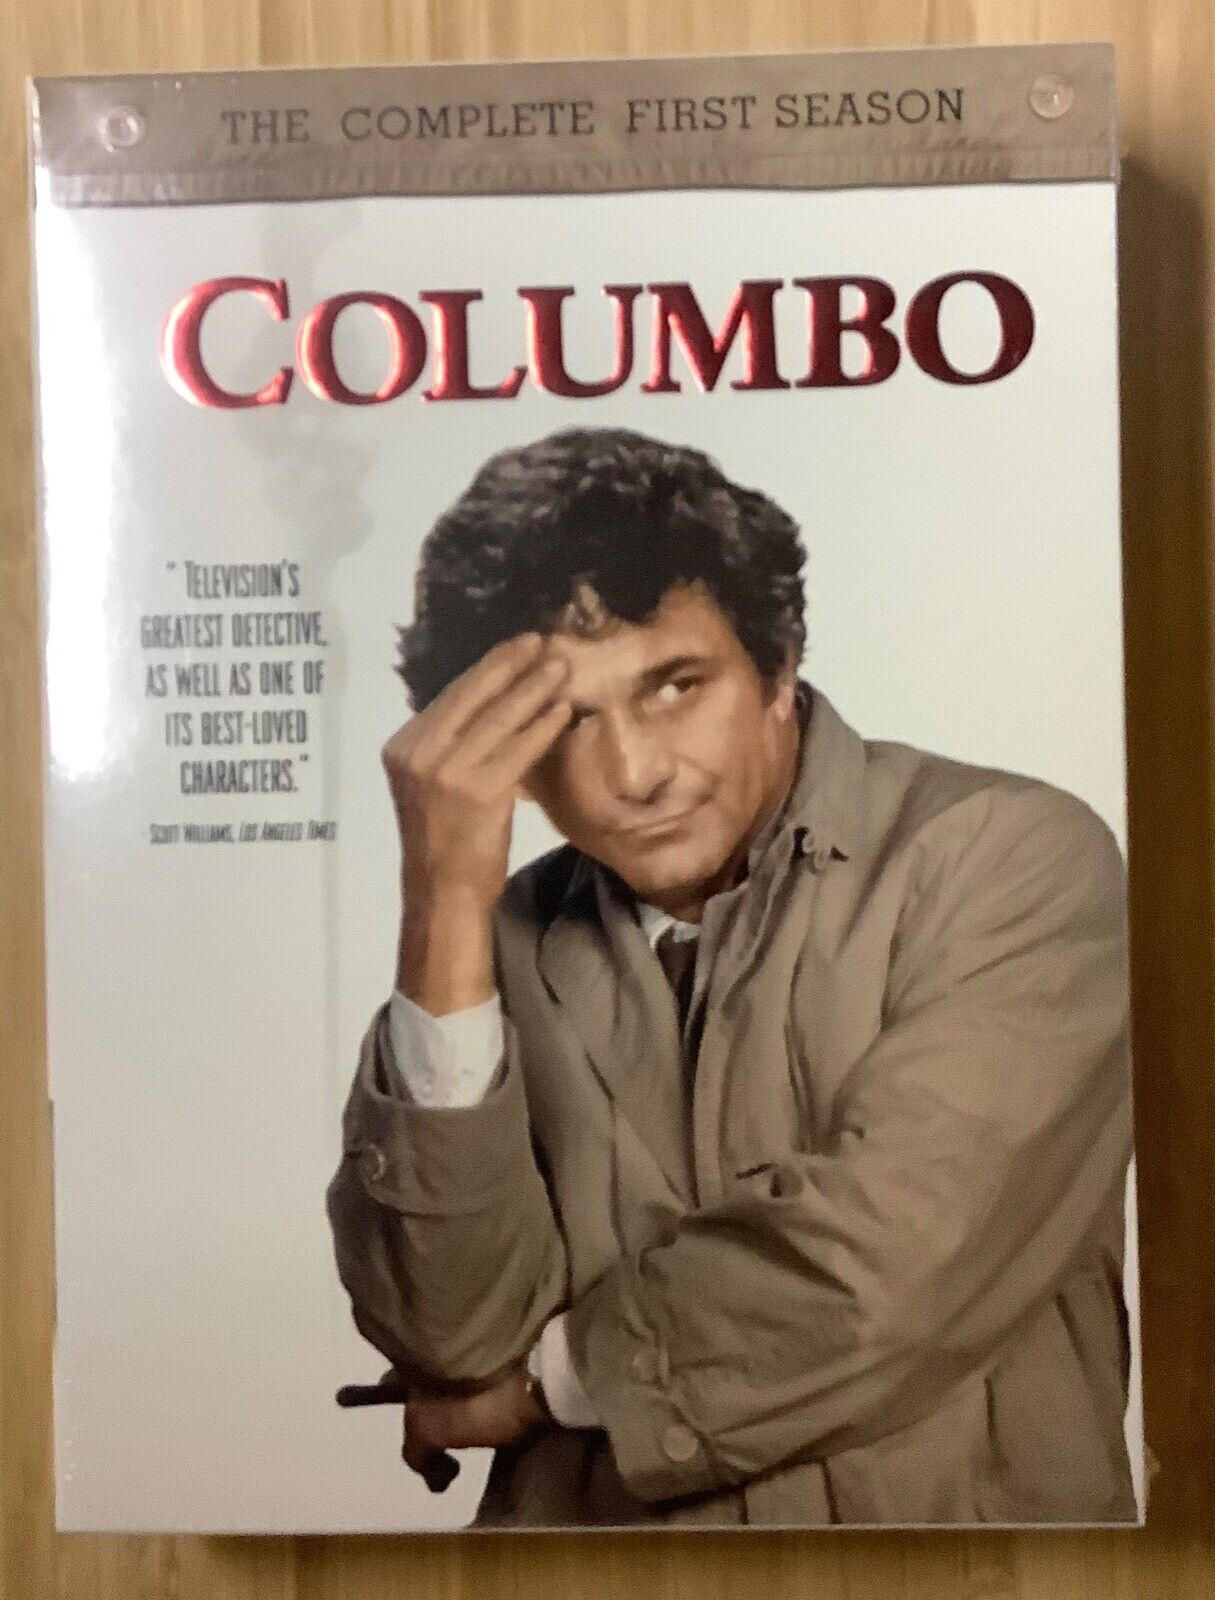 Columbo 1971-2 DVD Set First Season Plus 2 TV-movies Peter Falk NEW SEALED - $20.00